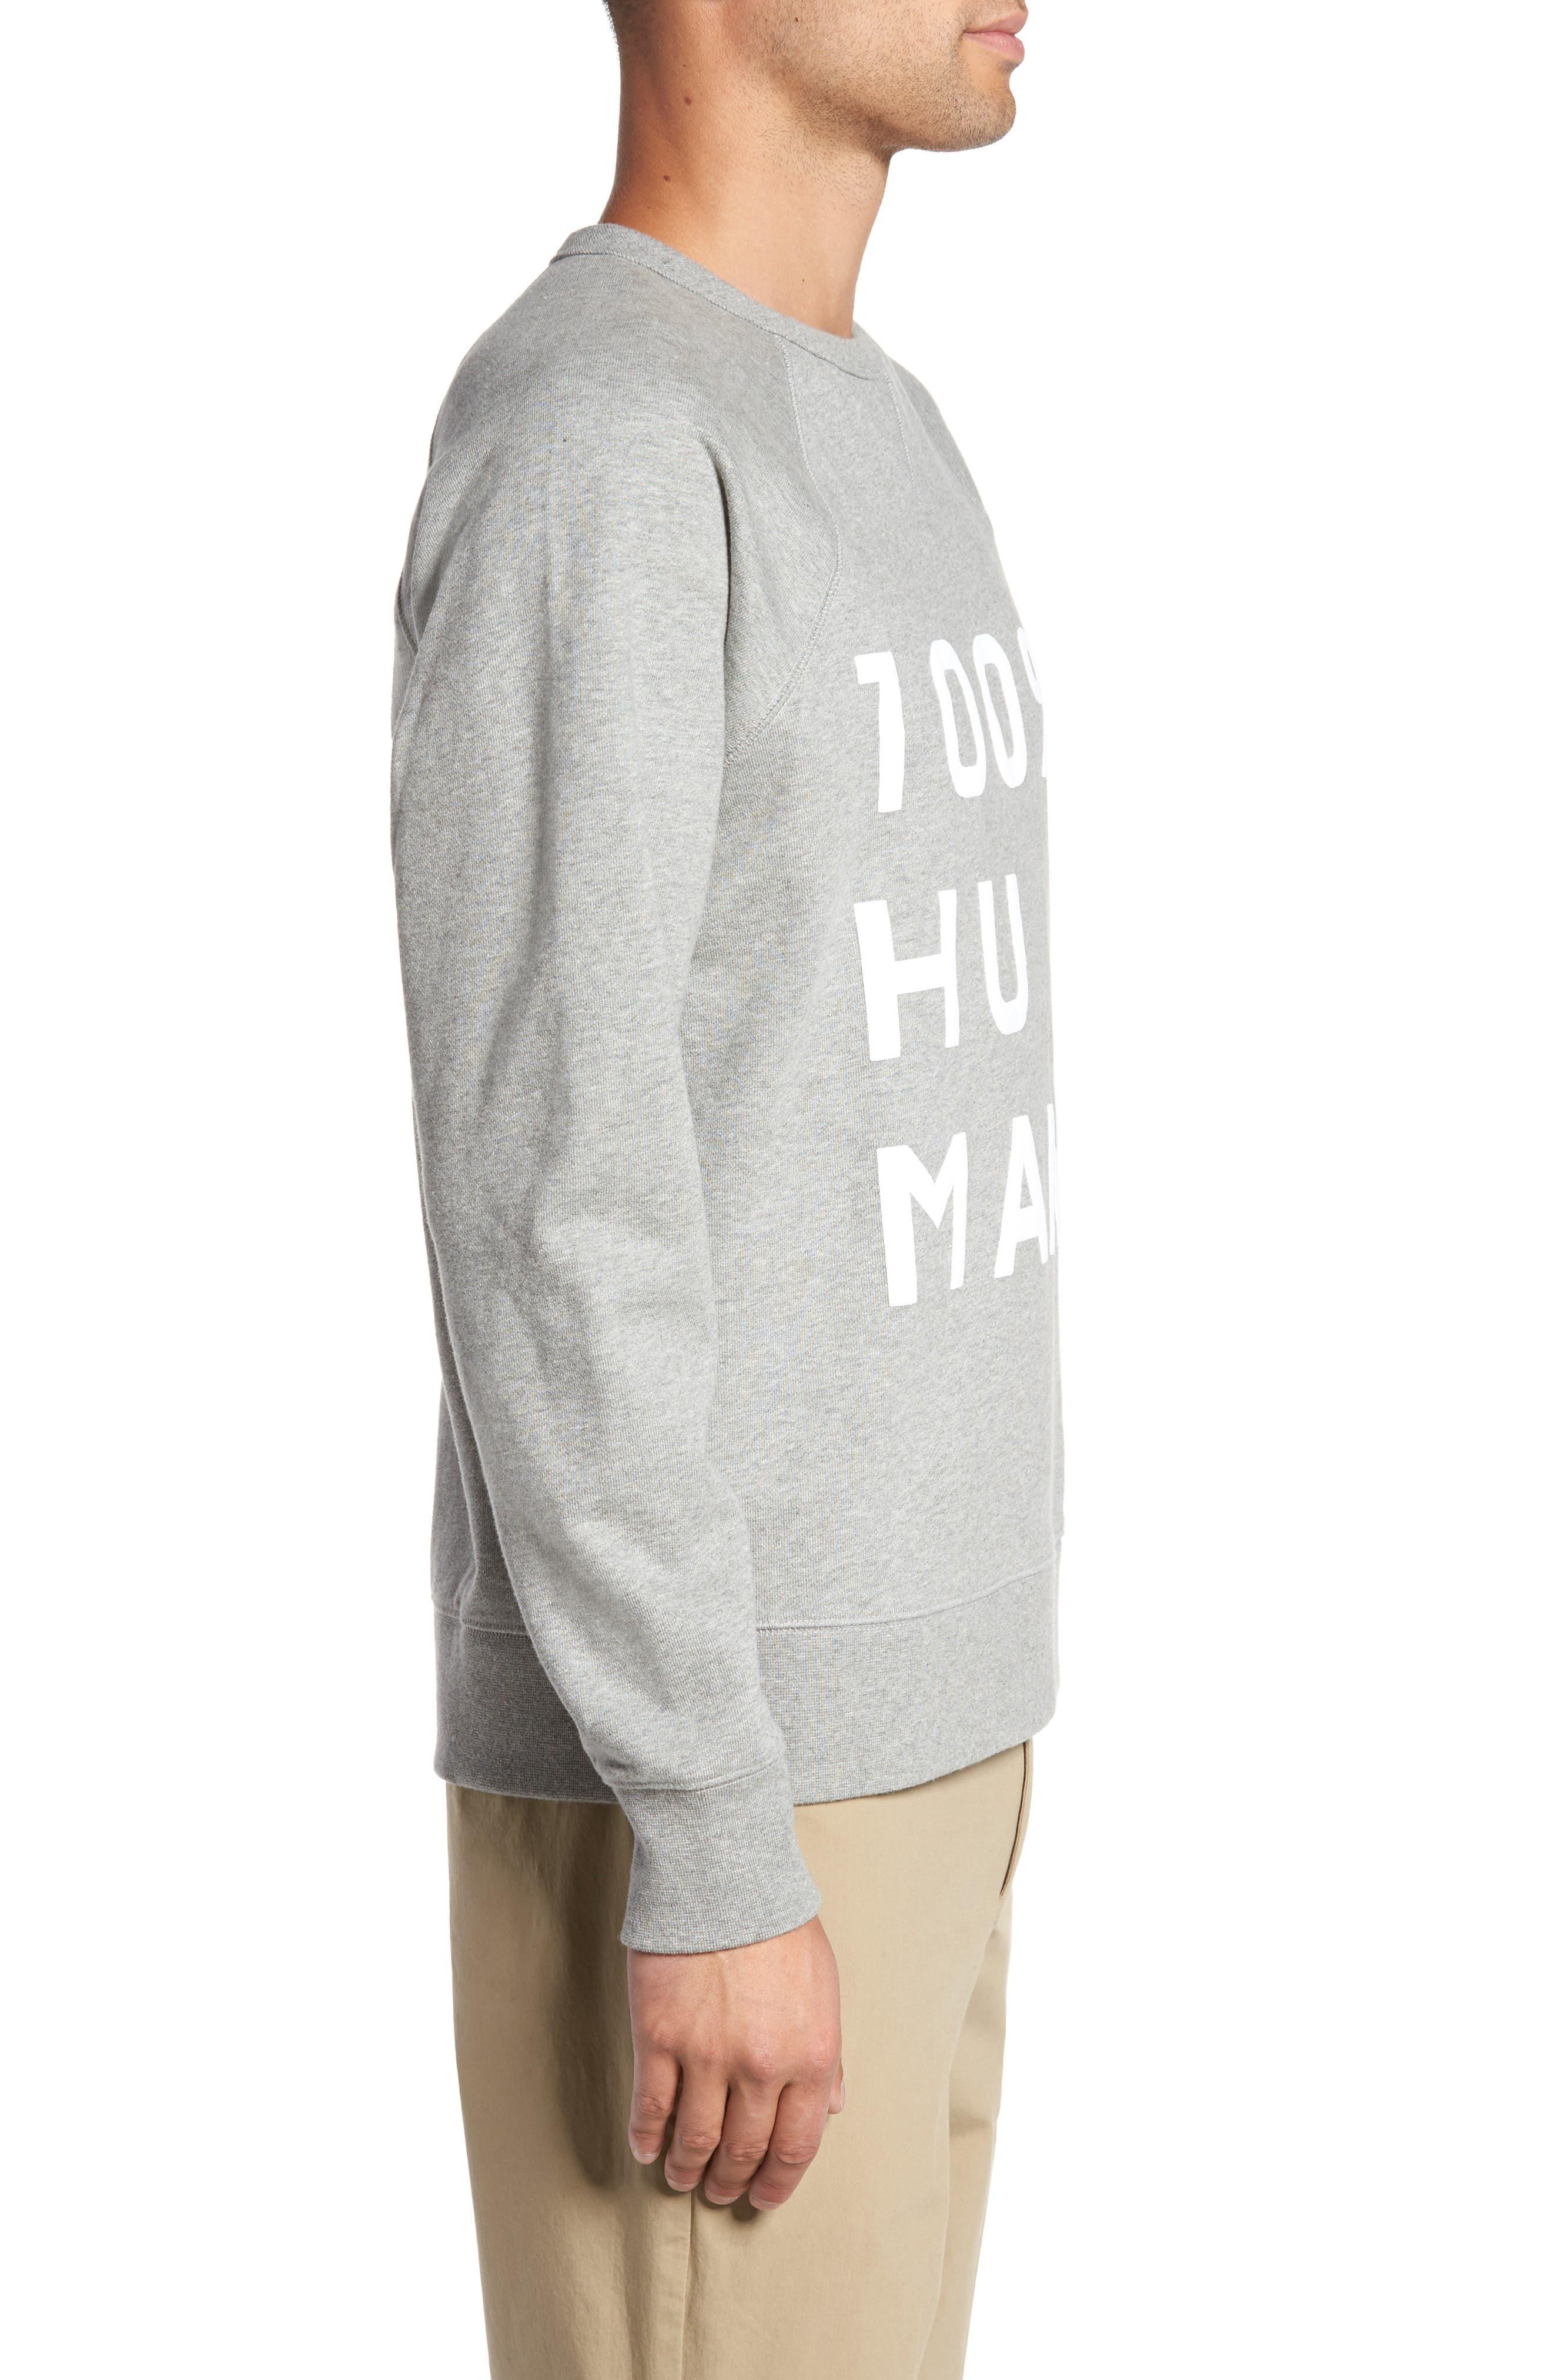 Alternate Image 3  - Everlane The 100% Human Unisex French Terry Sweatshirt